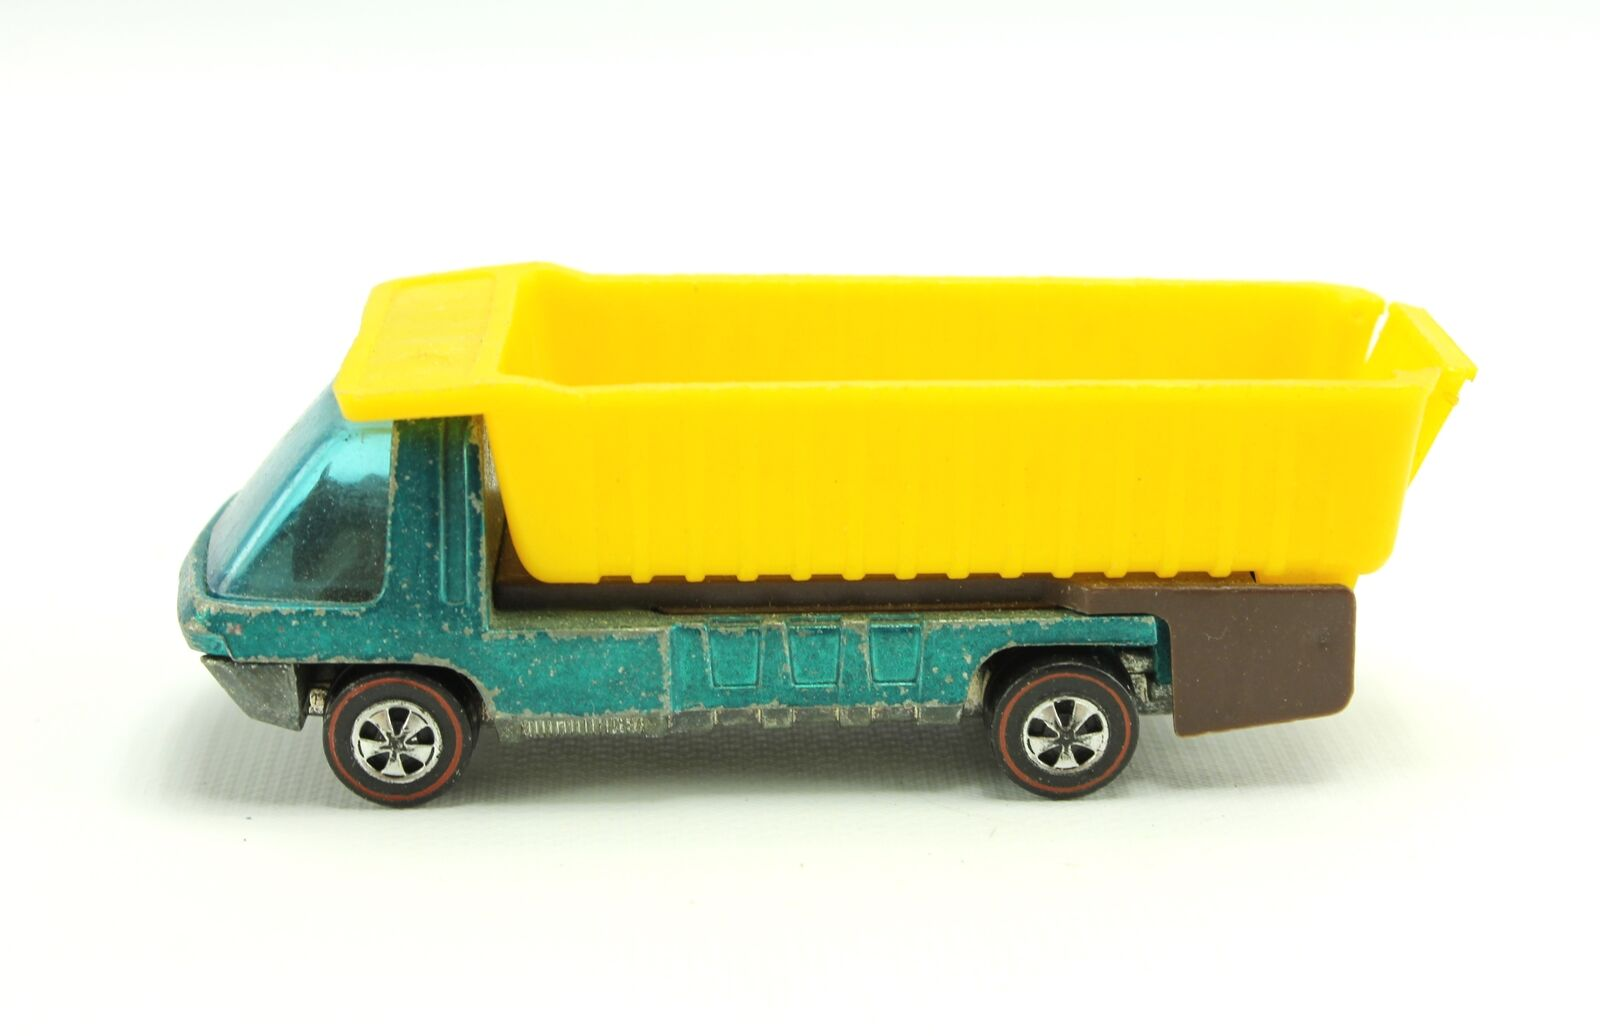 rotline Hot Wheels 1970 Heavyweights Blau Teal Diecast Dump Truck Ships Quick